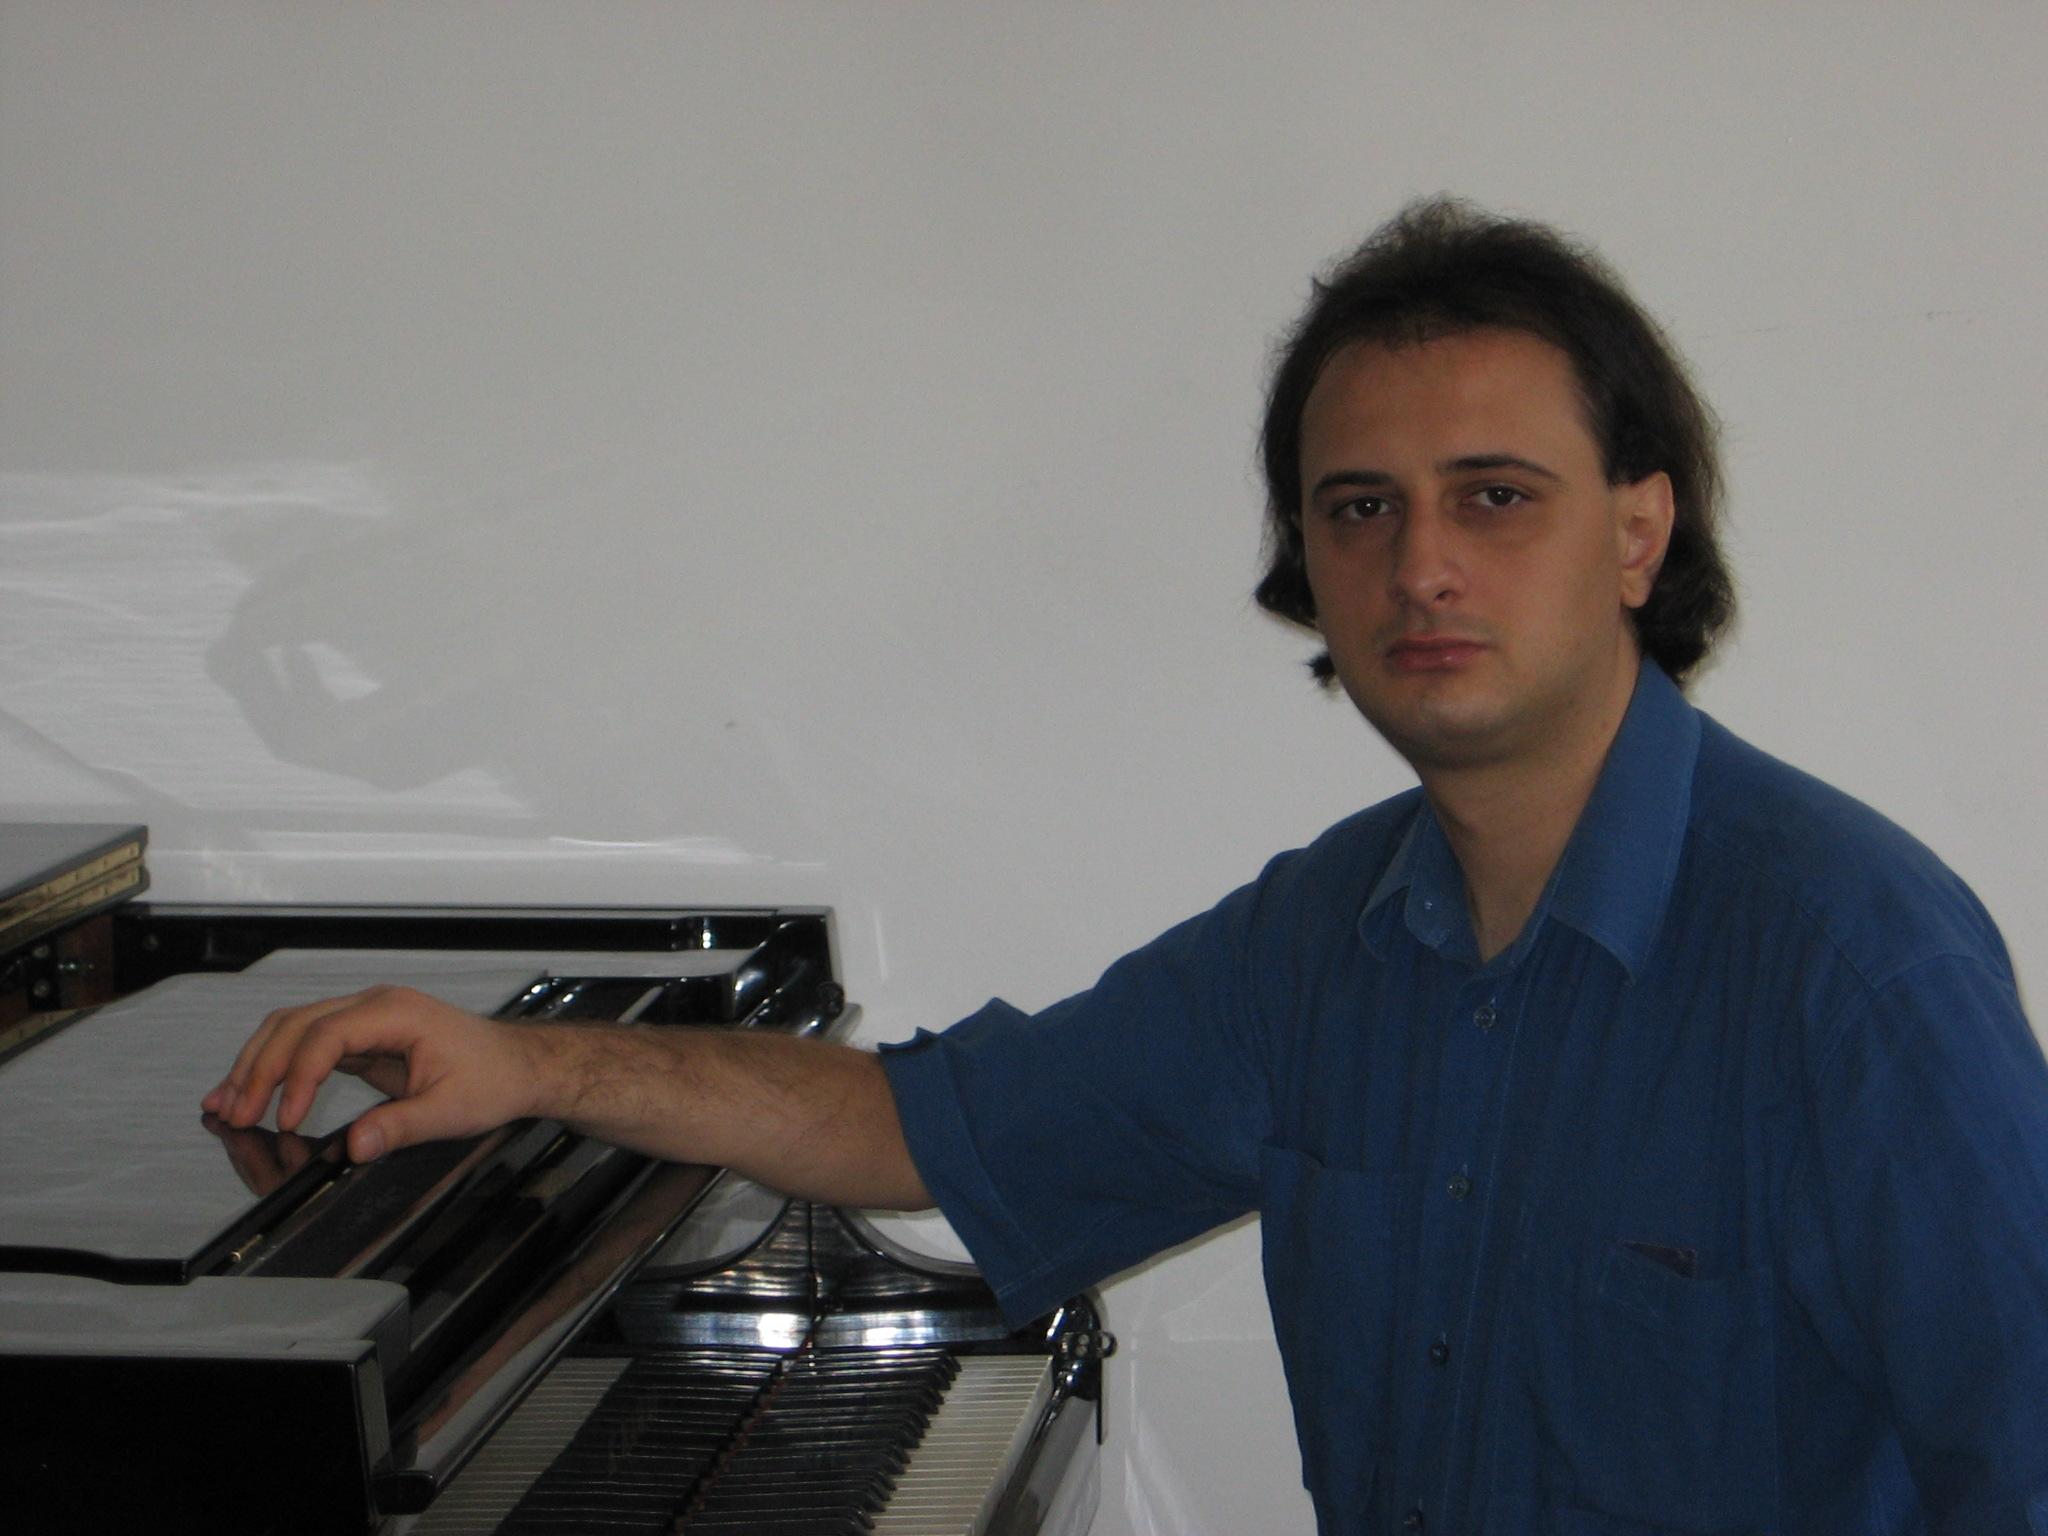 MihaiManiceanu